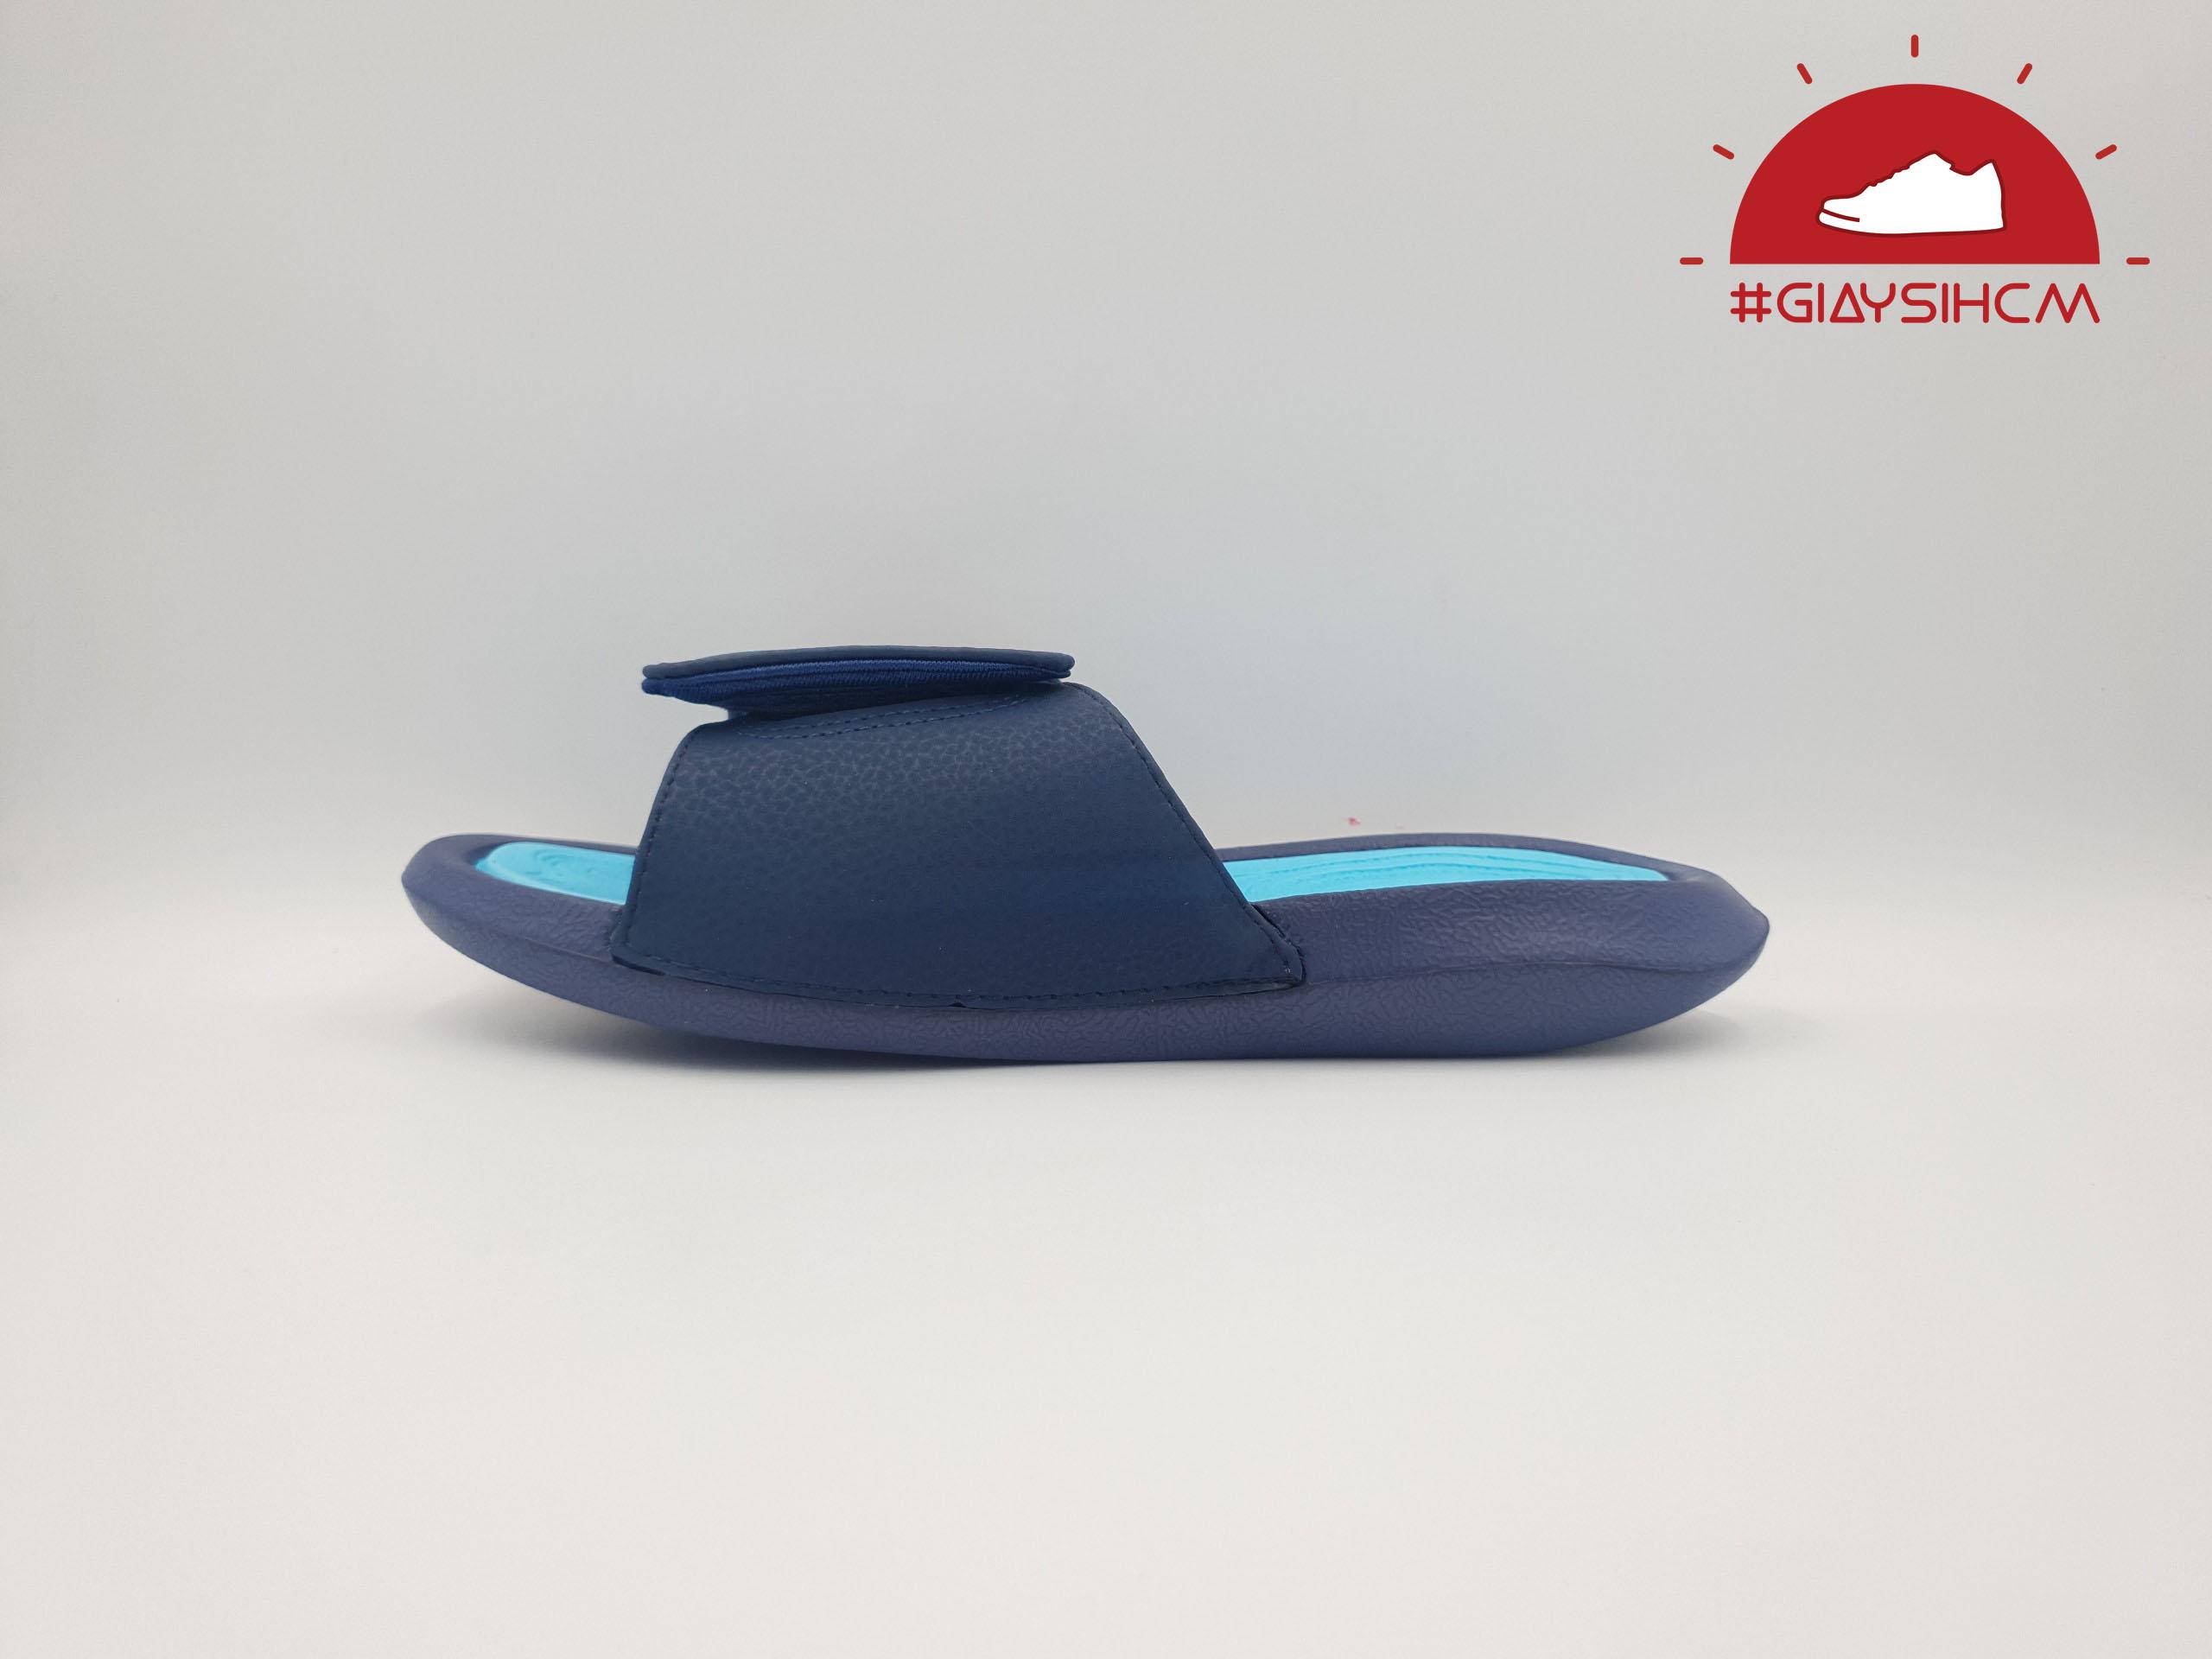 Dep-jordan-hydro-6 mau-xanh-lot-xanh-duong